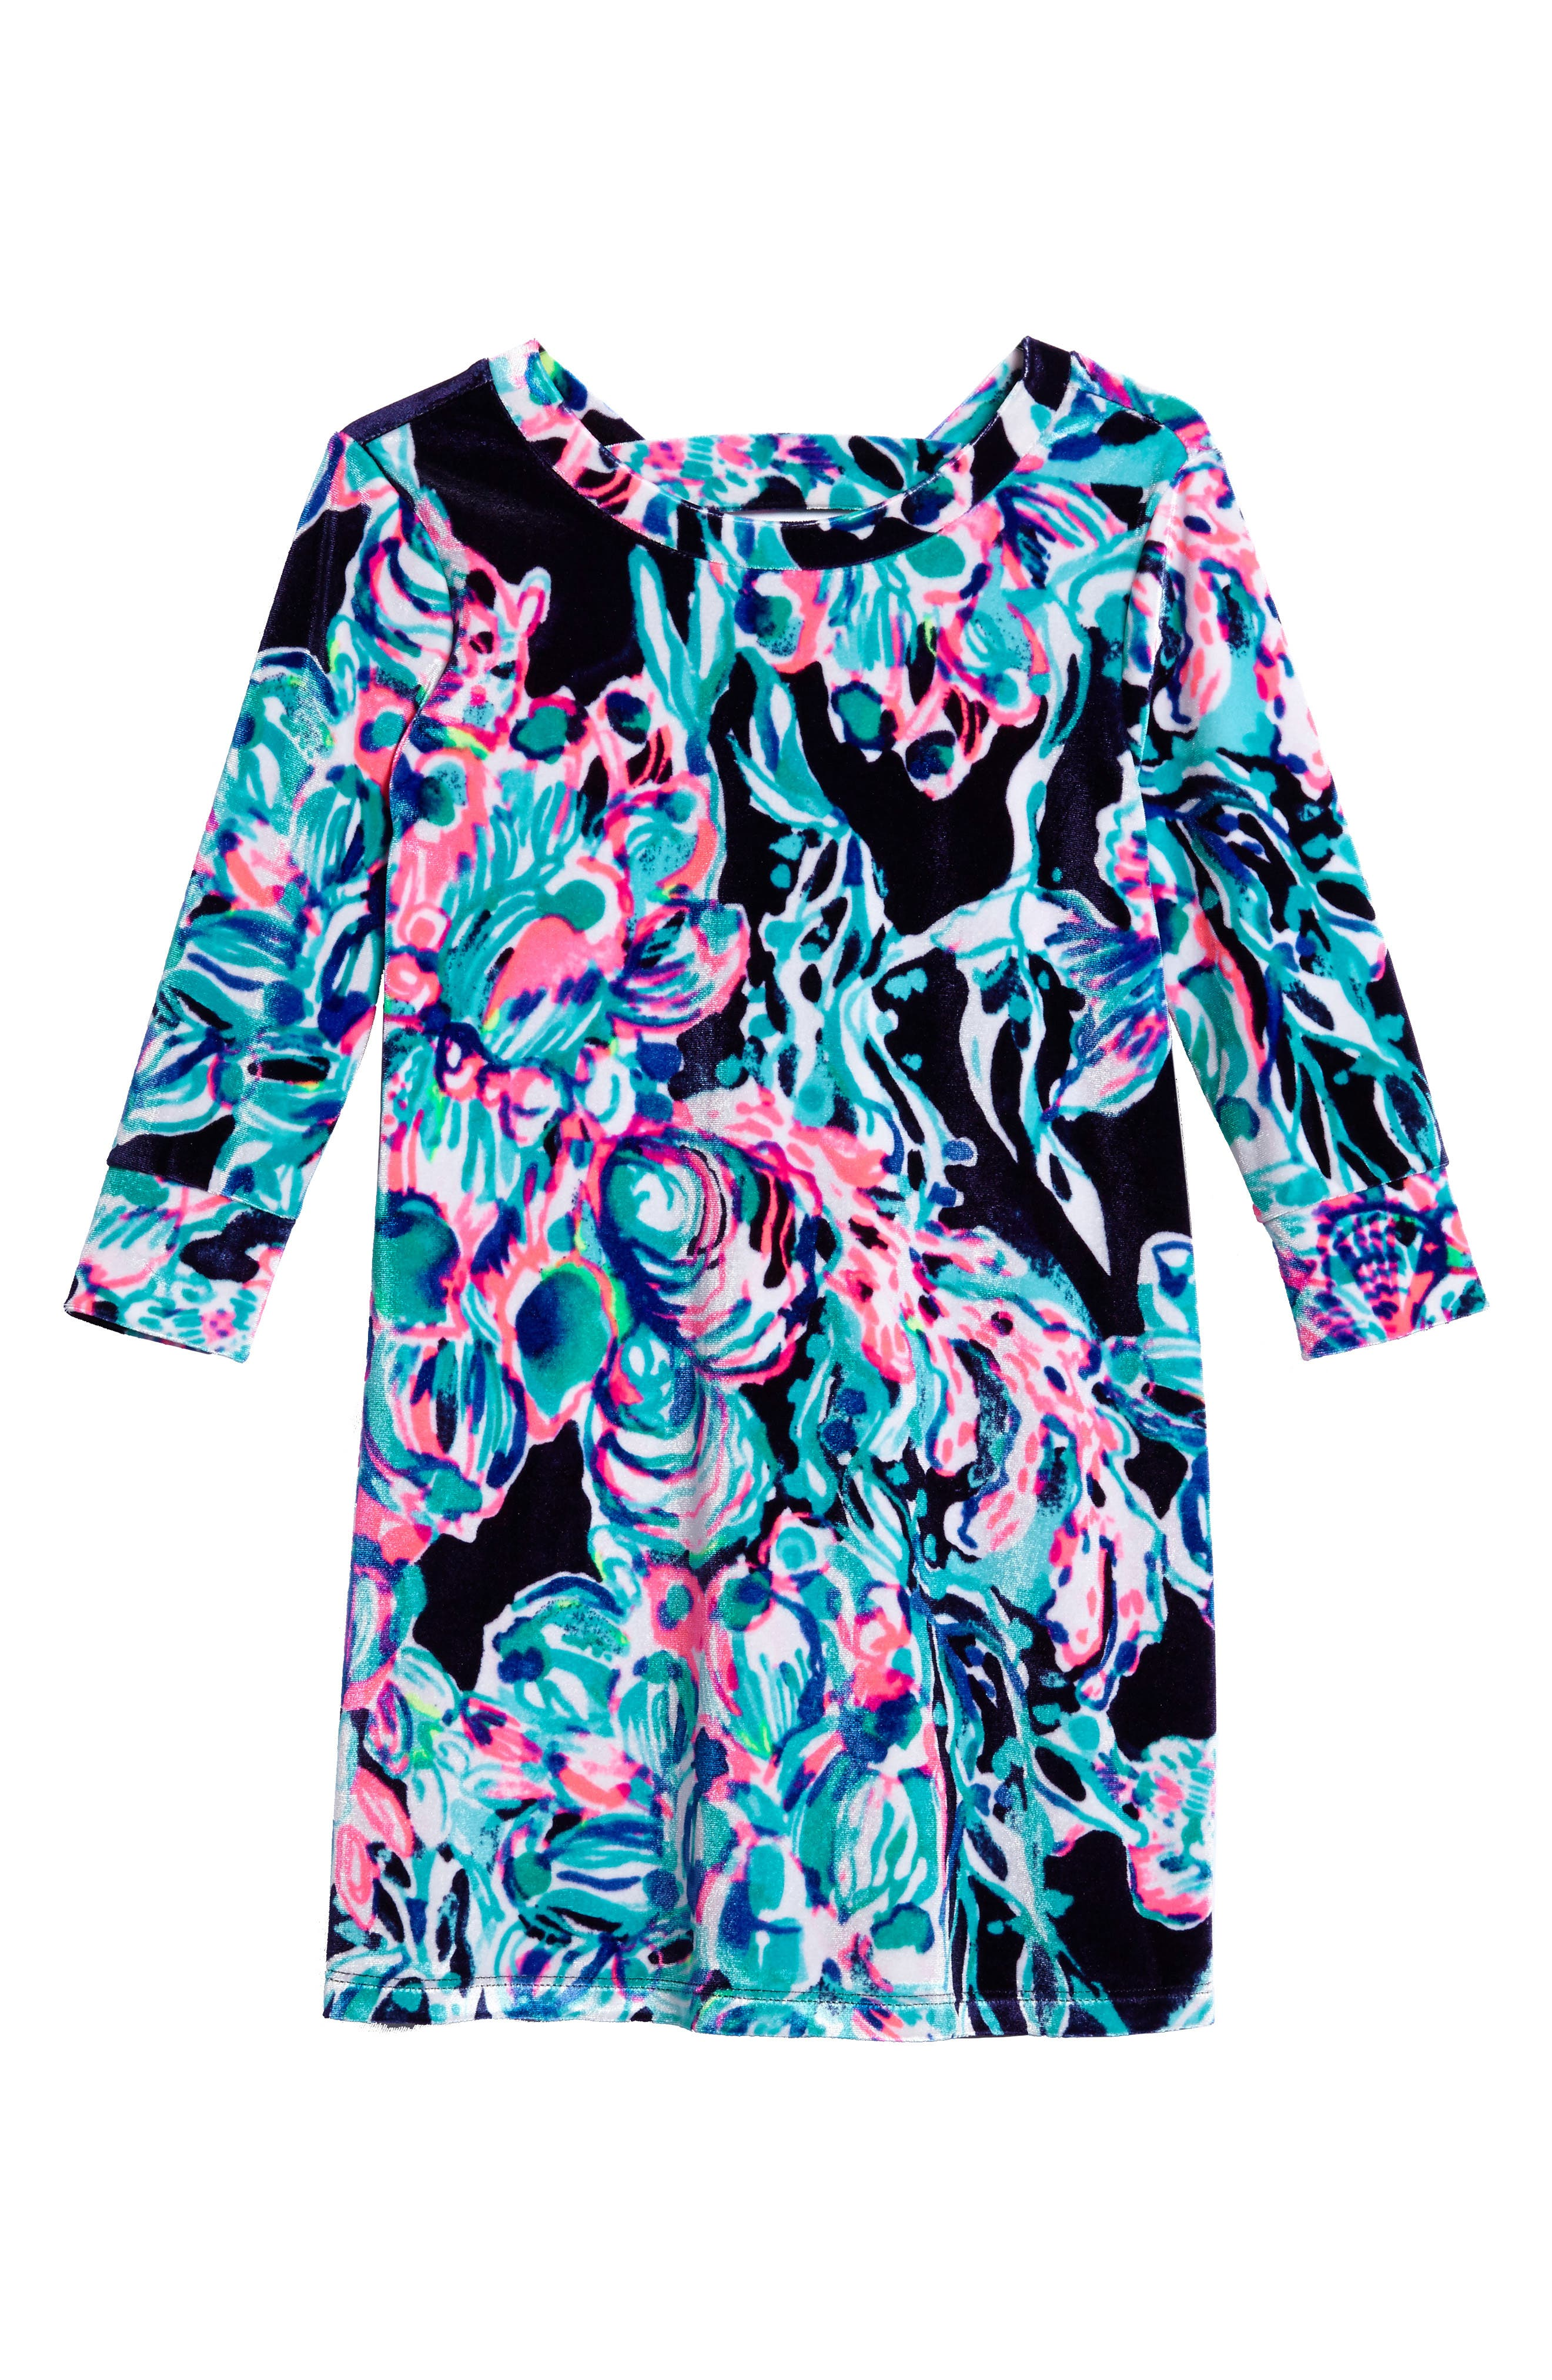 Alternate Image 1 Selected - Lilly Pulitzer® Mini Olive Velour Dress (Toddler Girls, Little Girls & Big Girls)